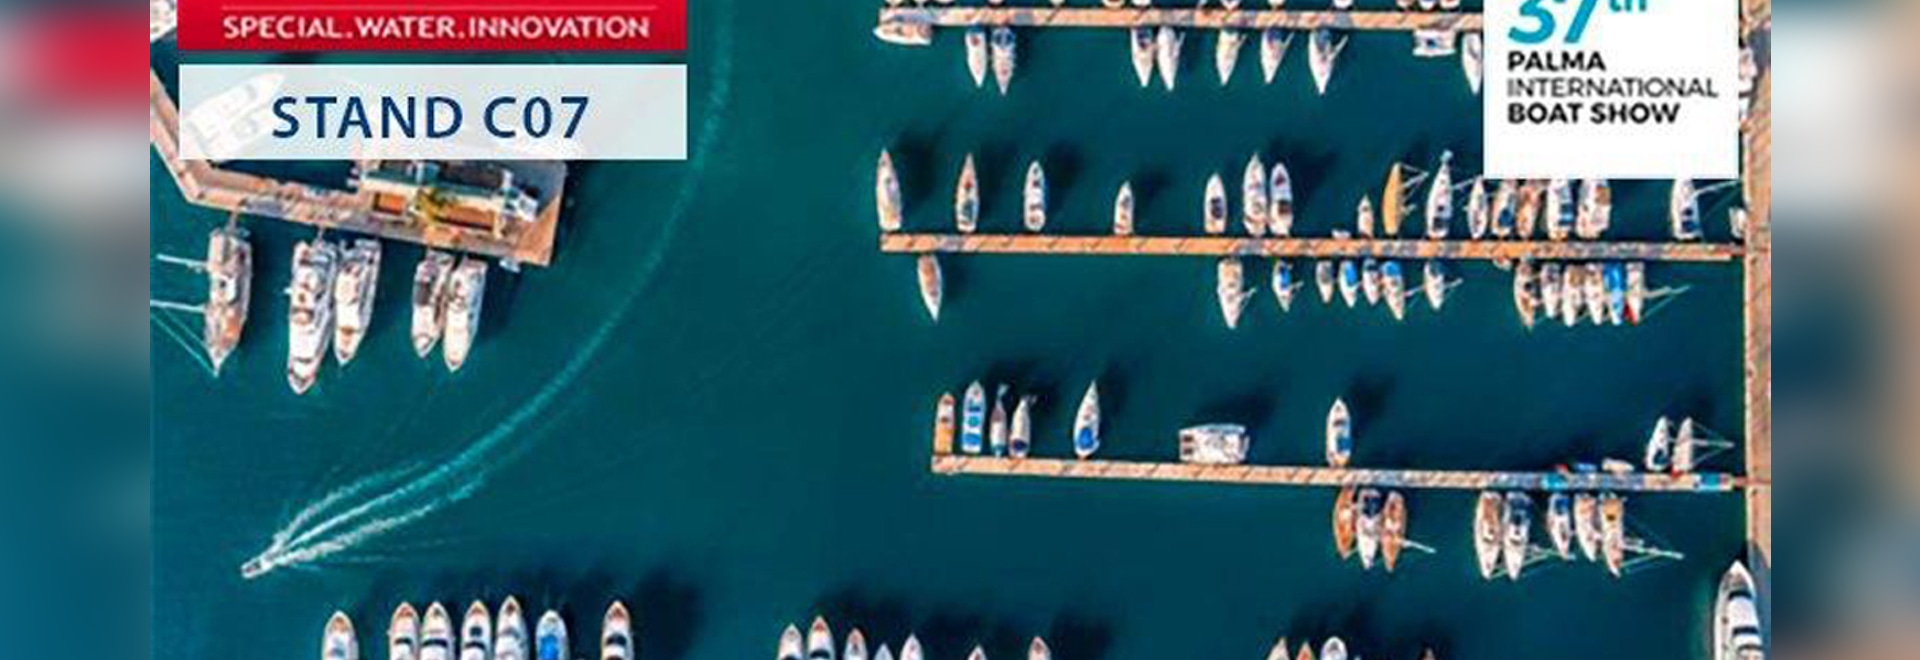 Palma Boat Show 2020